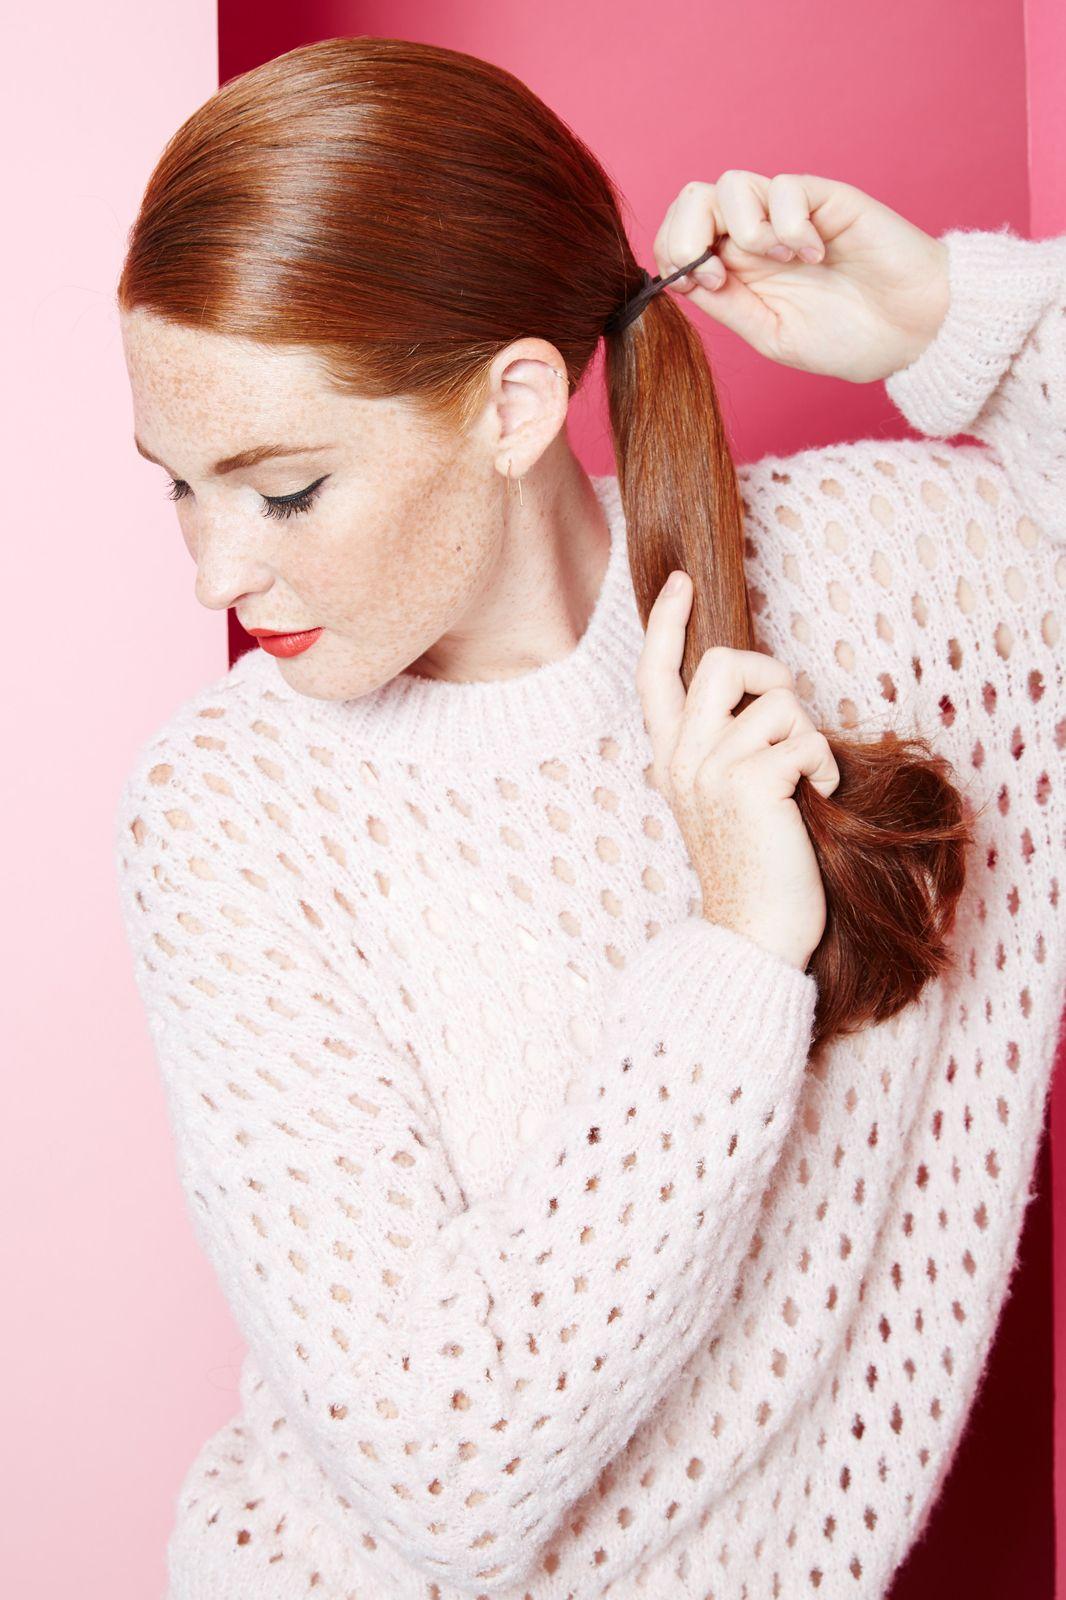 Hair weave fabric diy creative new looks